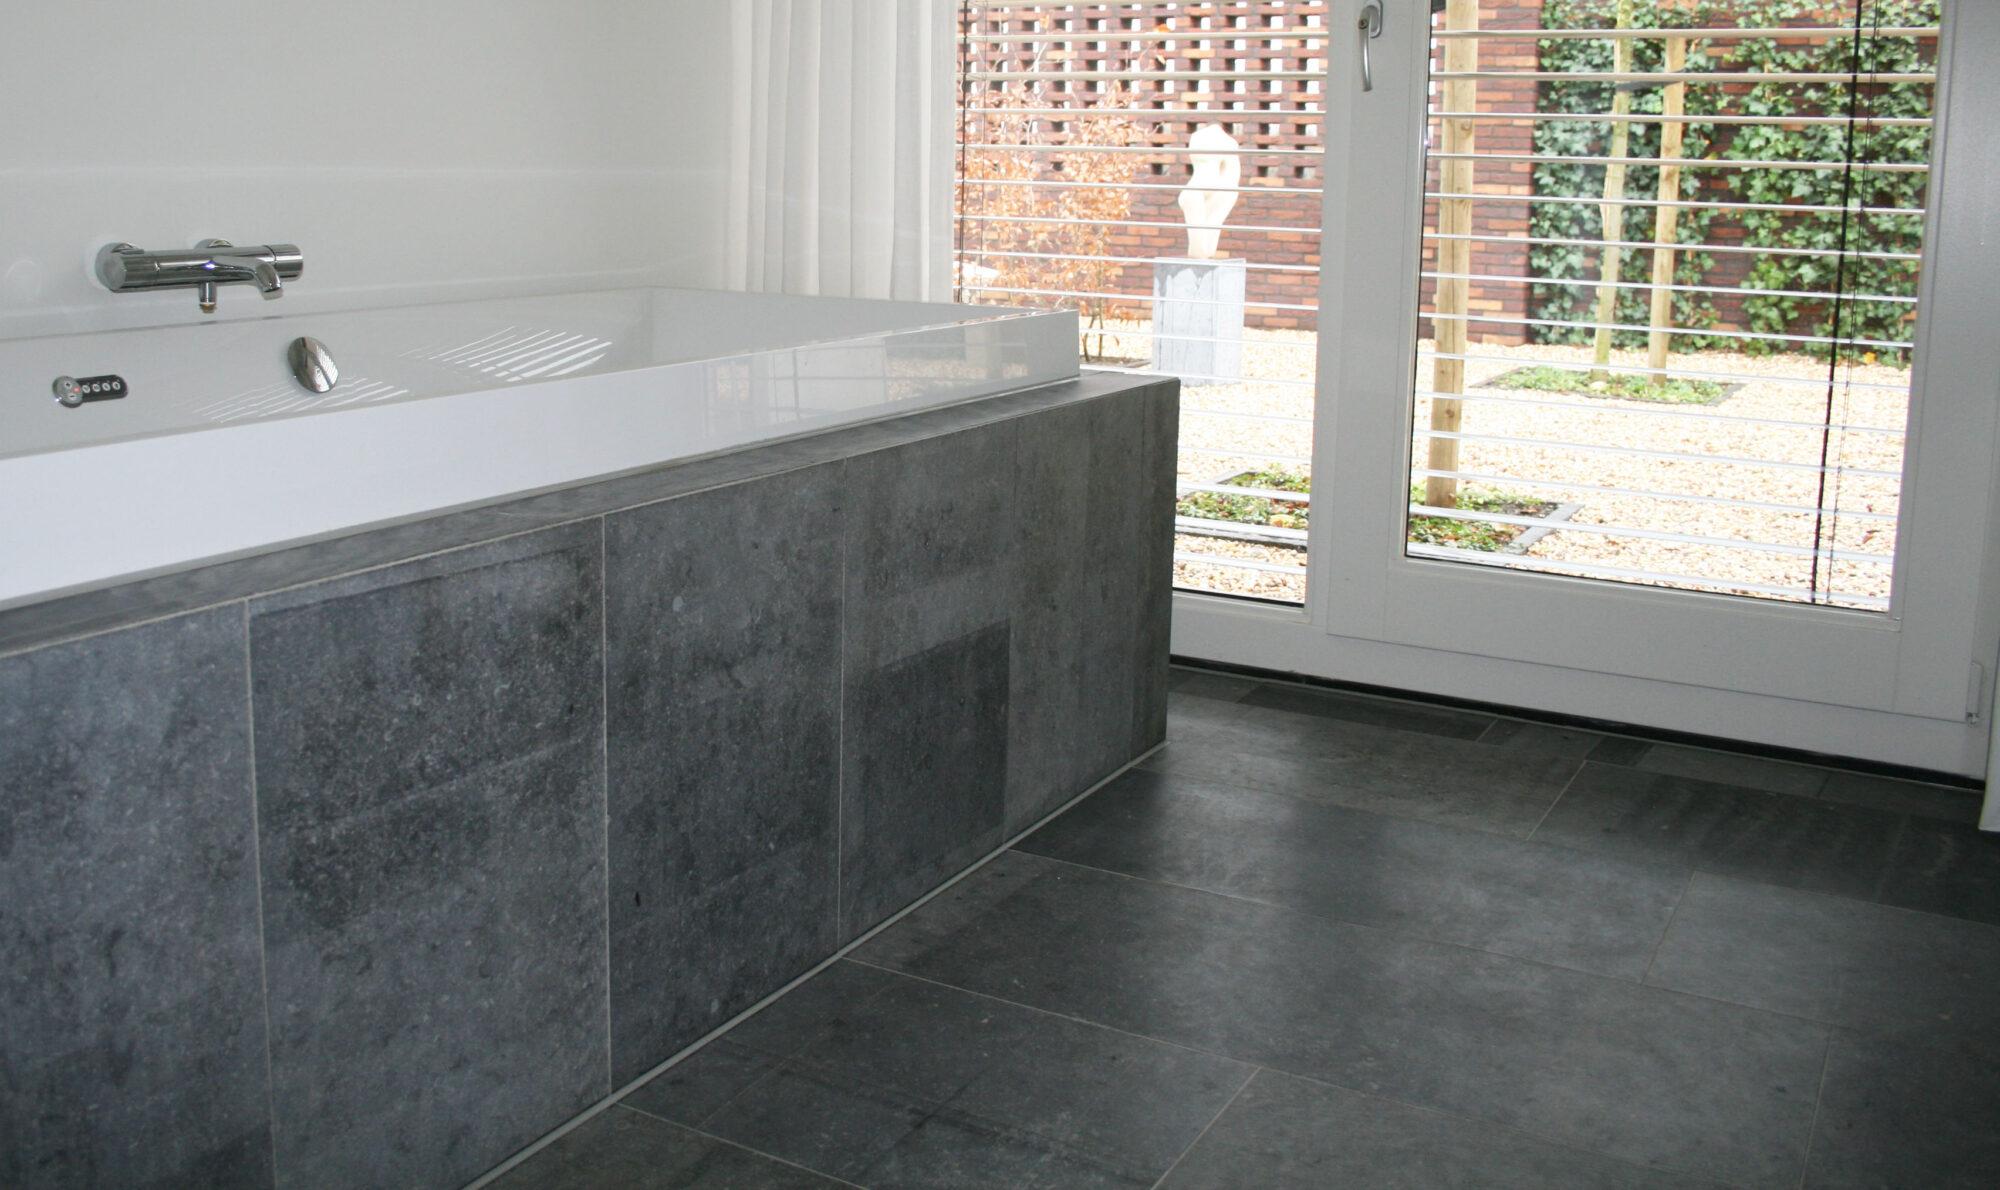 Belgian Blue stone - Floor tiles - Natural stone - Tiles Sawn 2